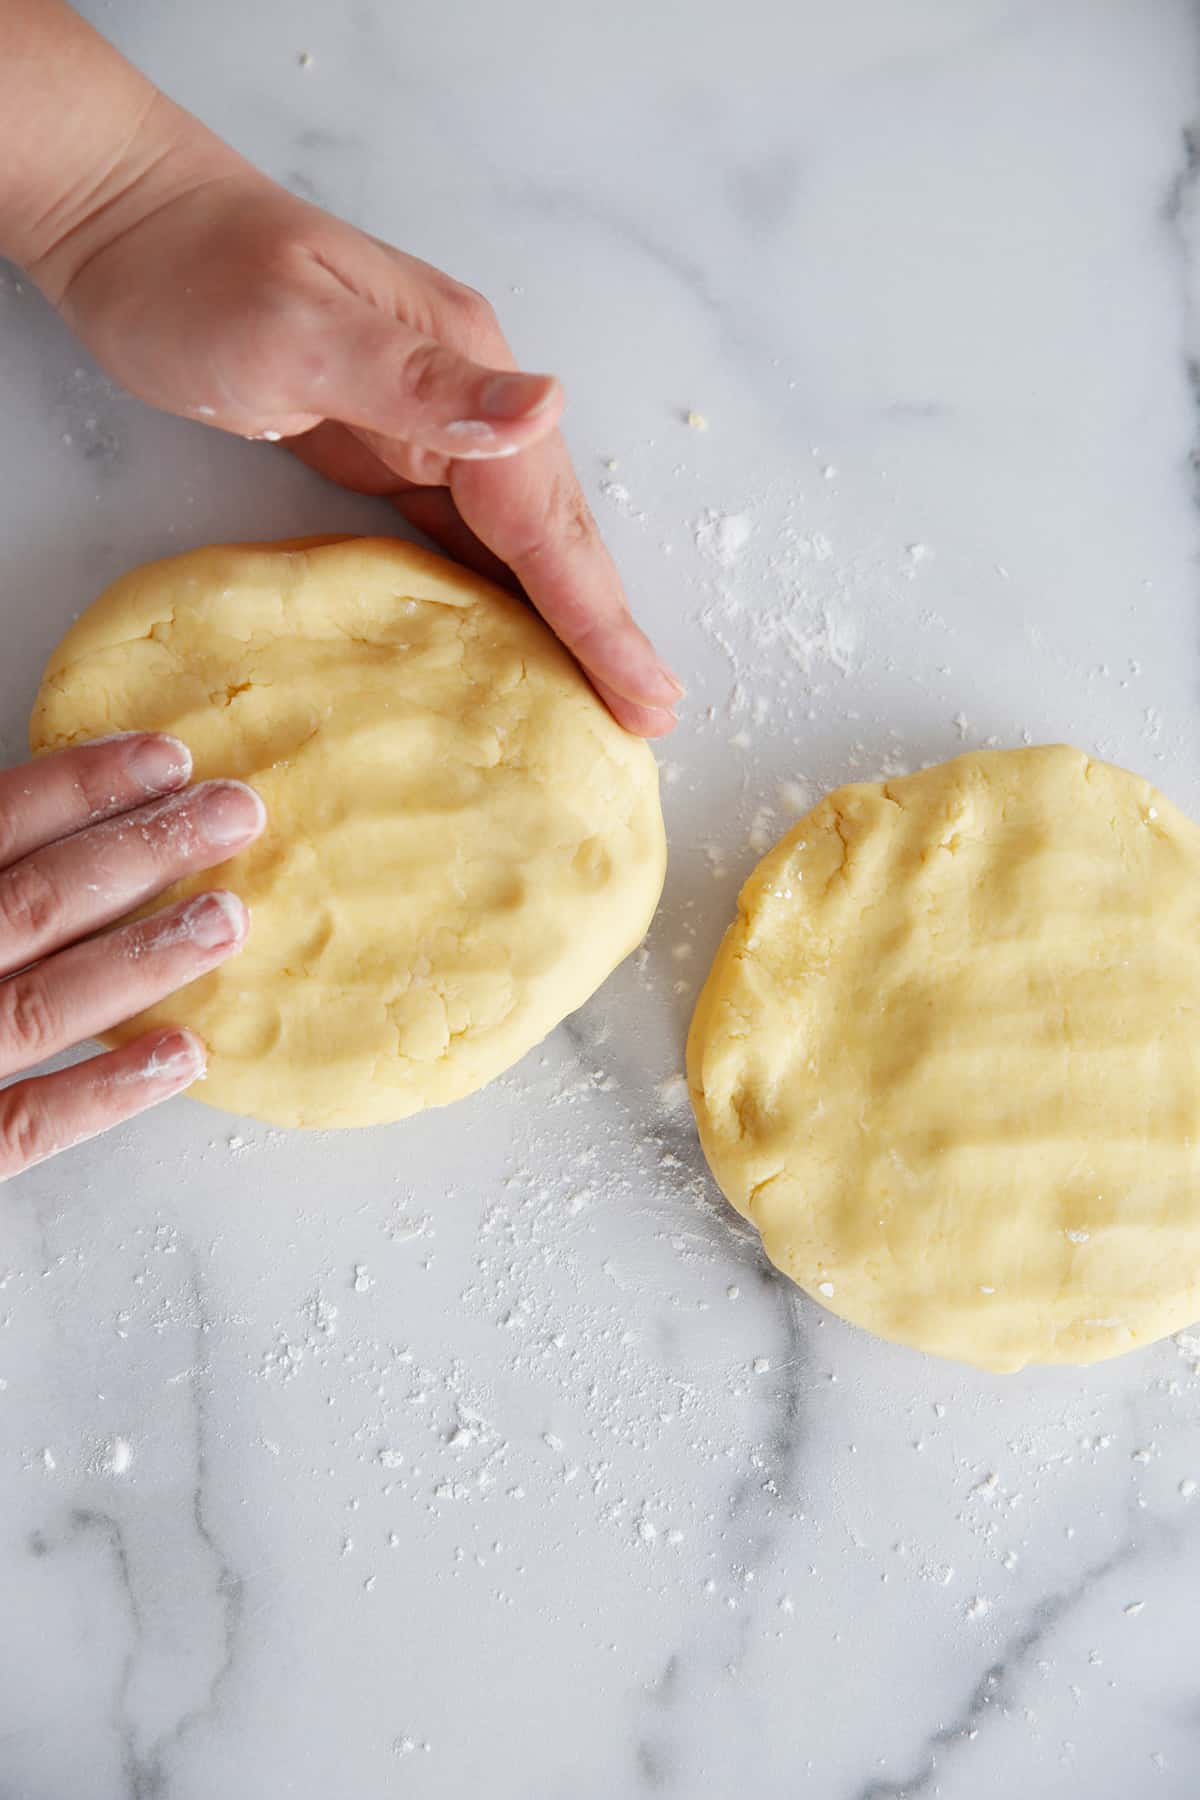 How to Make a Gluten-Free Pie Crust